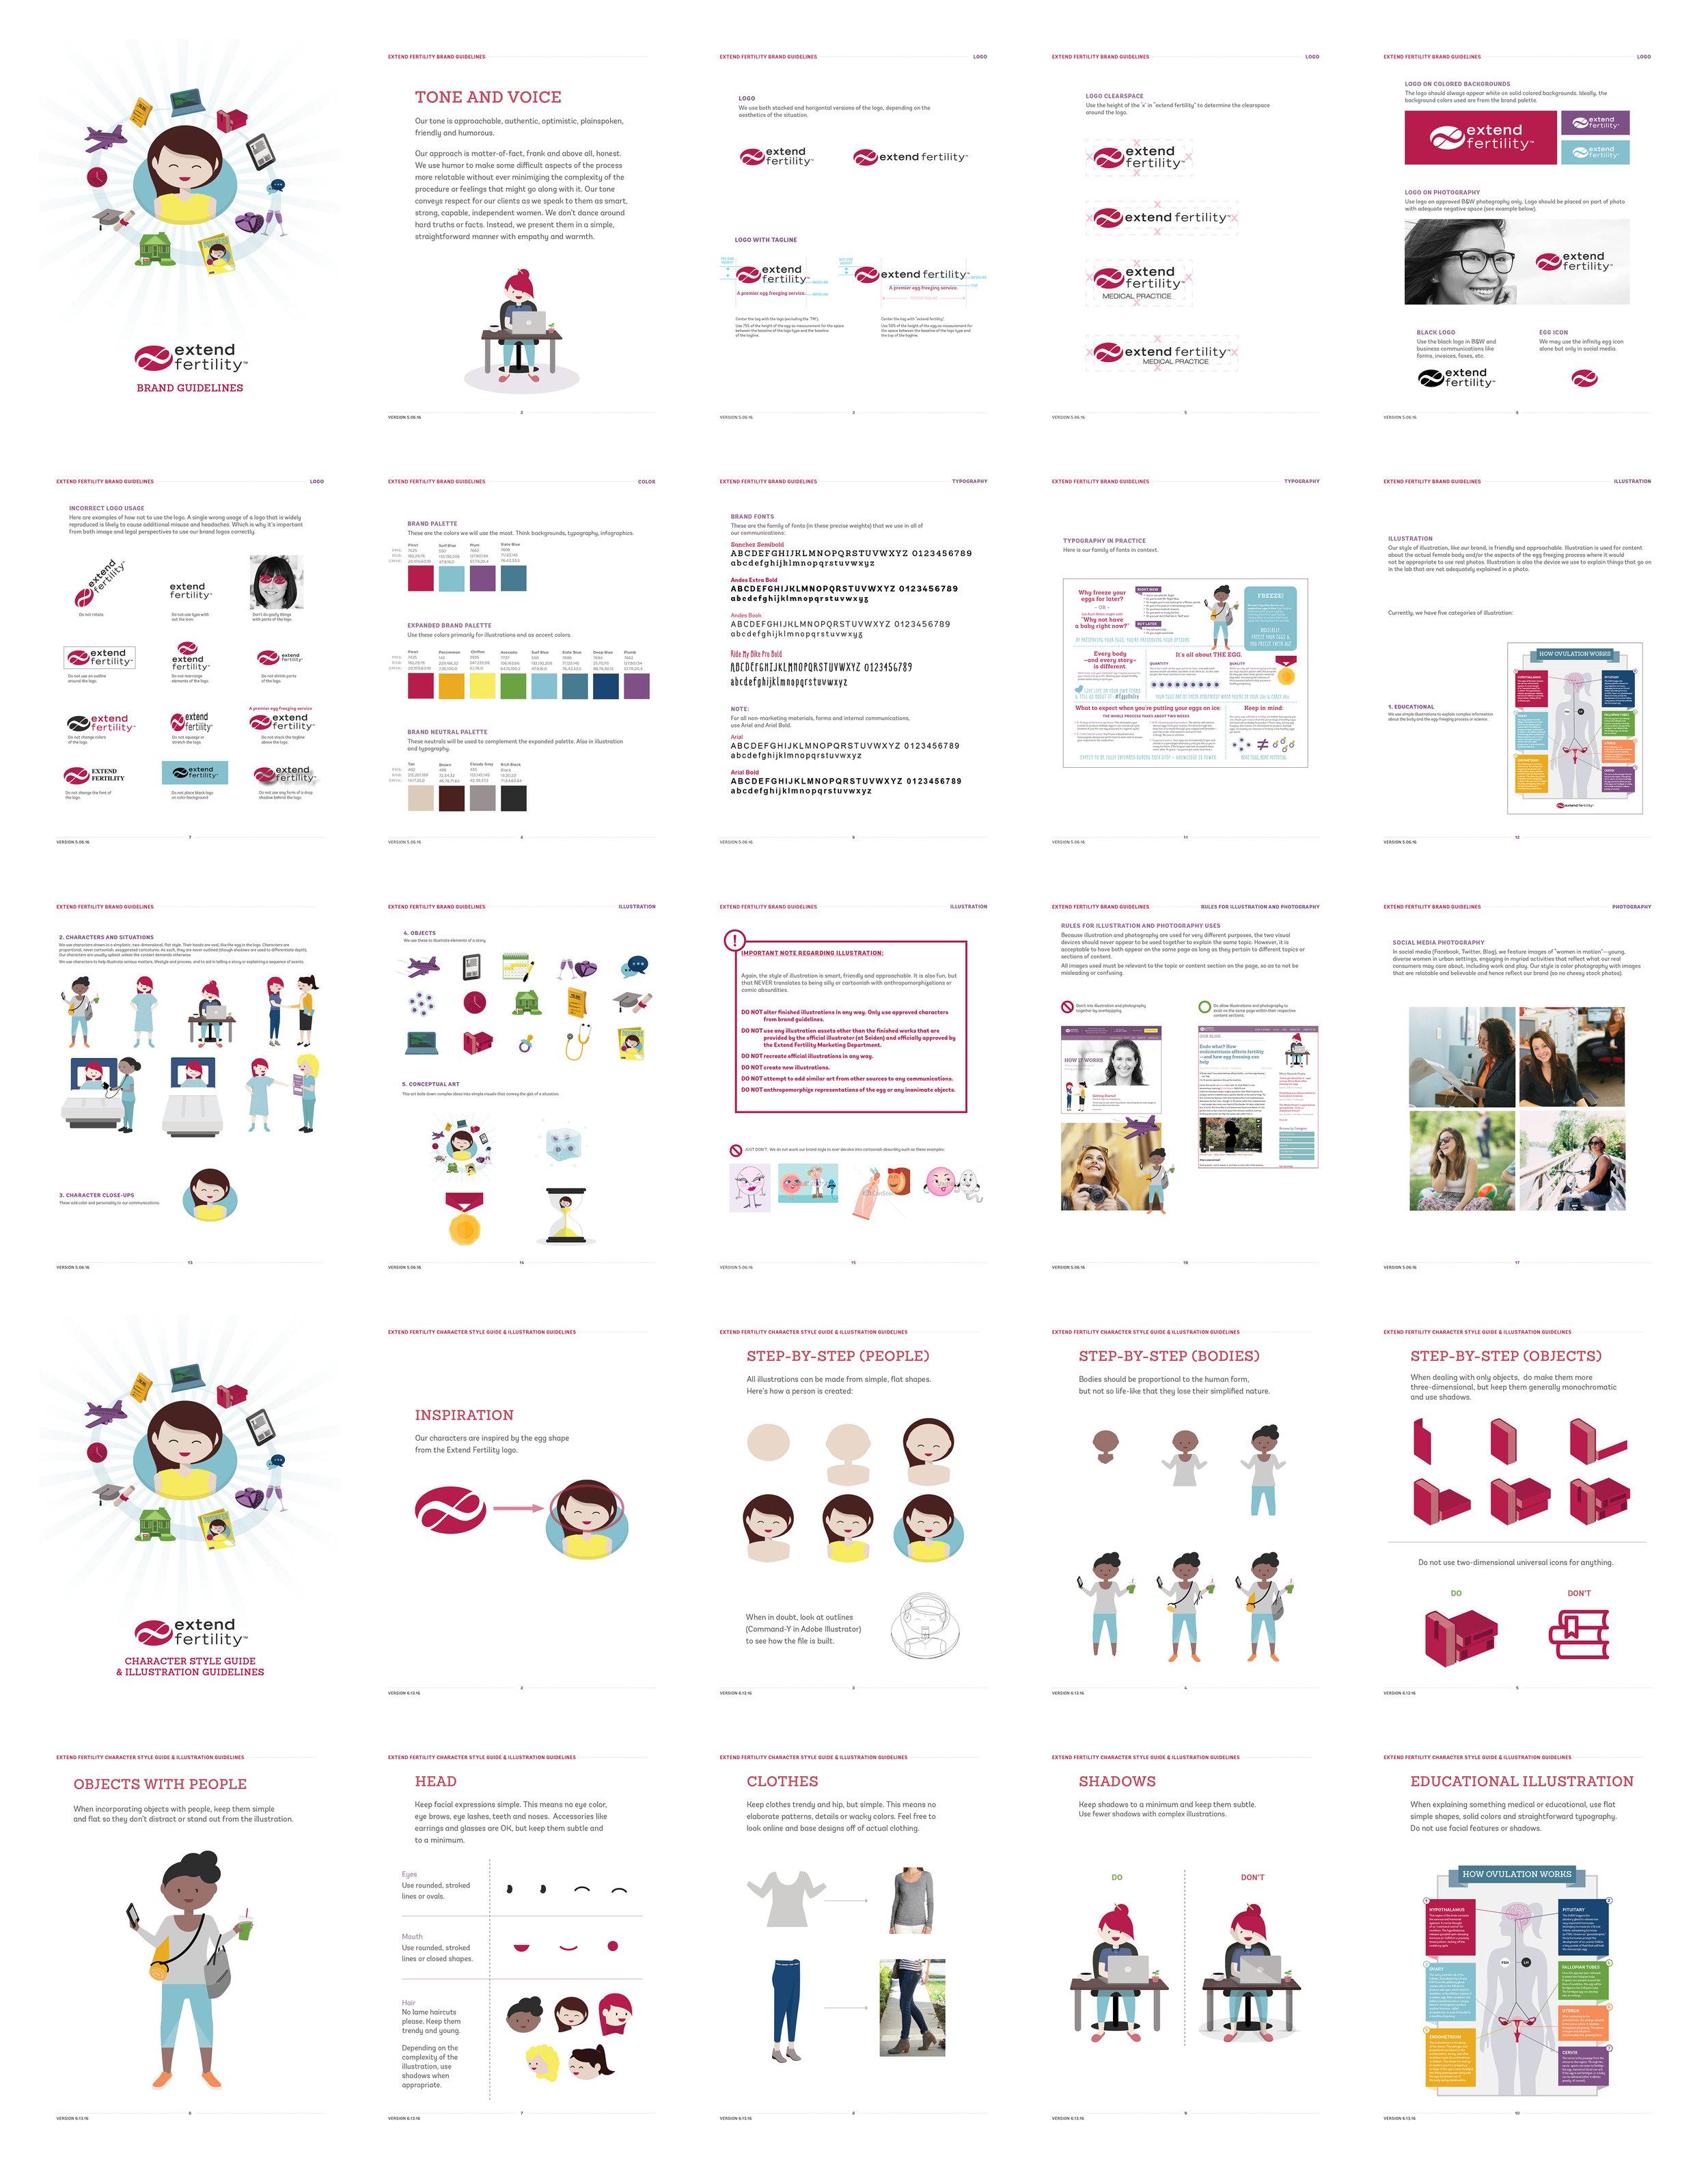 EF Guideline_Poster.jpg